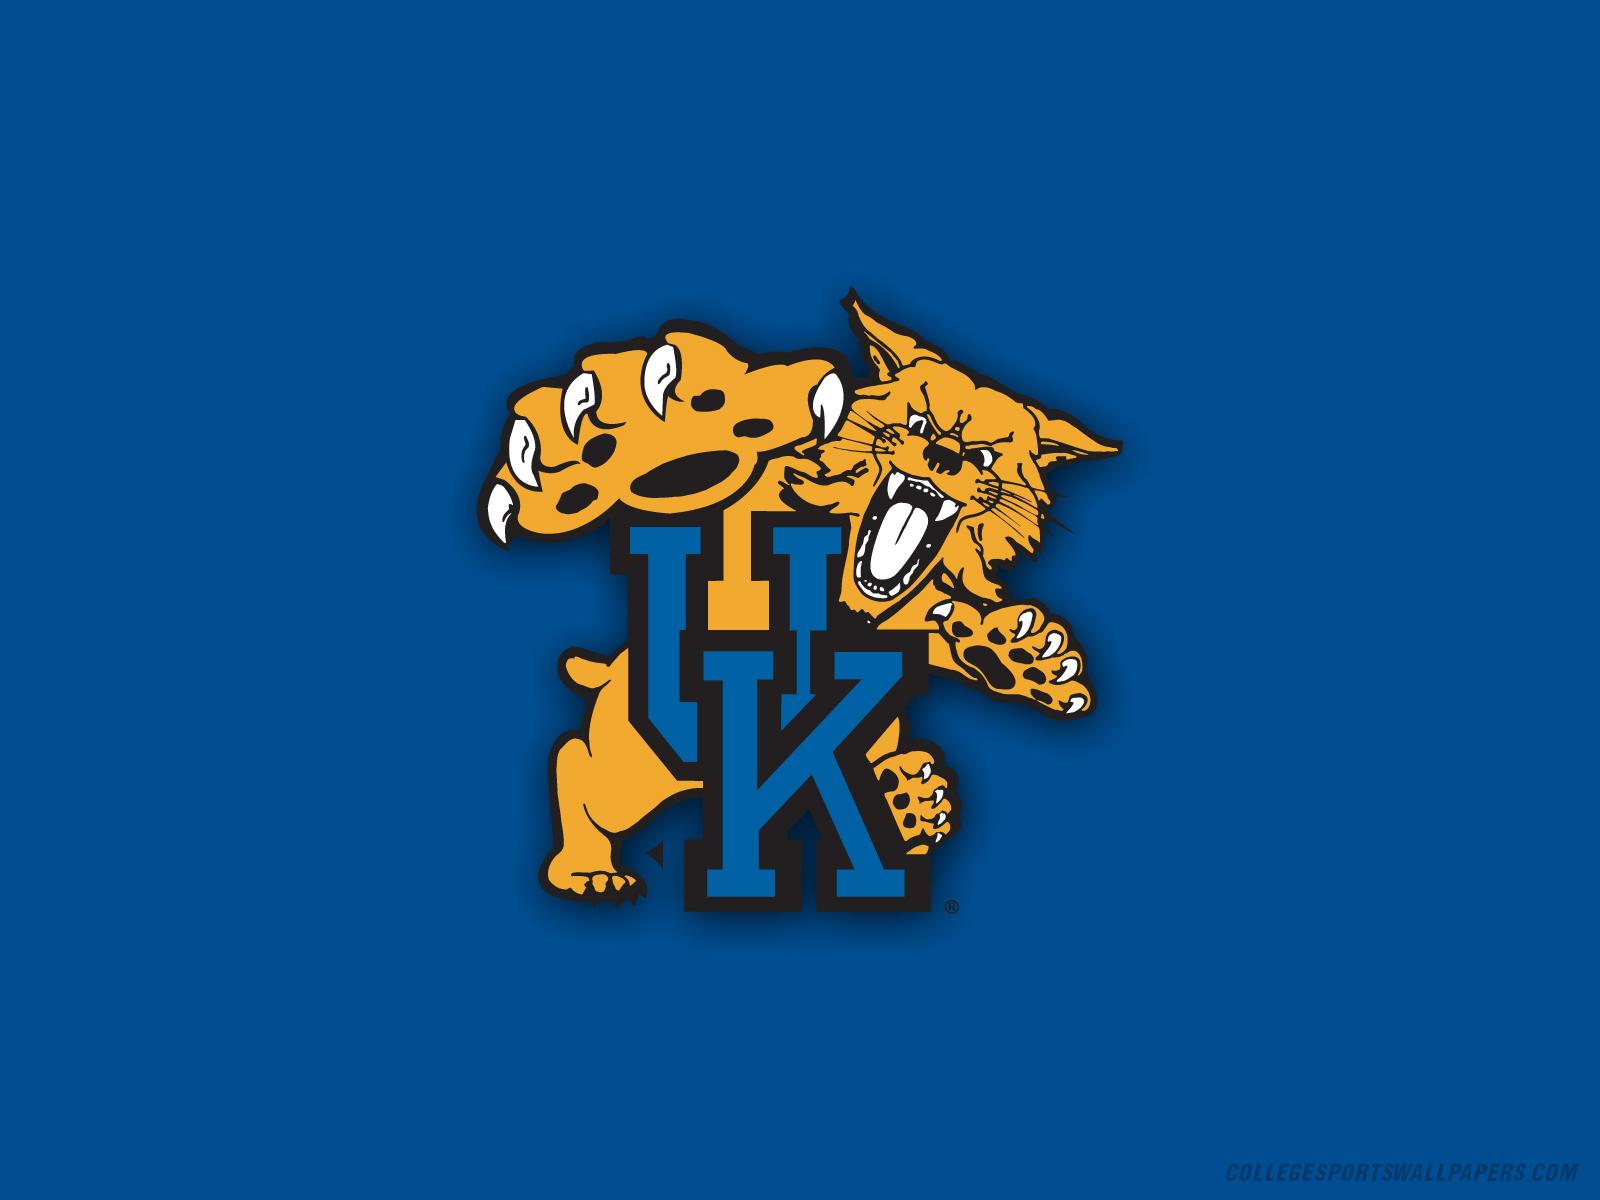 Kentucky Wildcats Uk logo 1600x1200